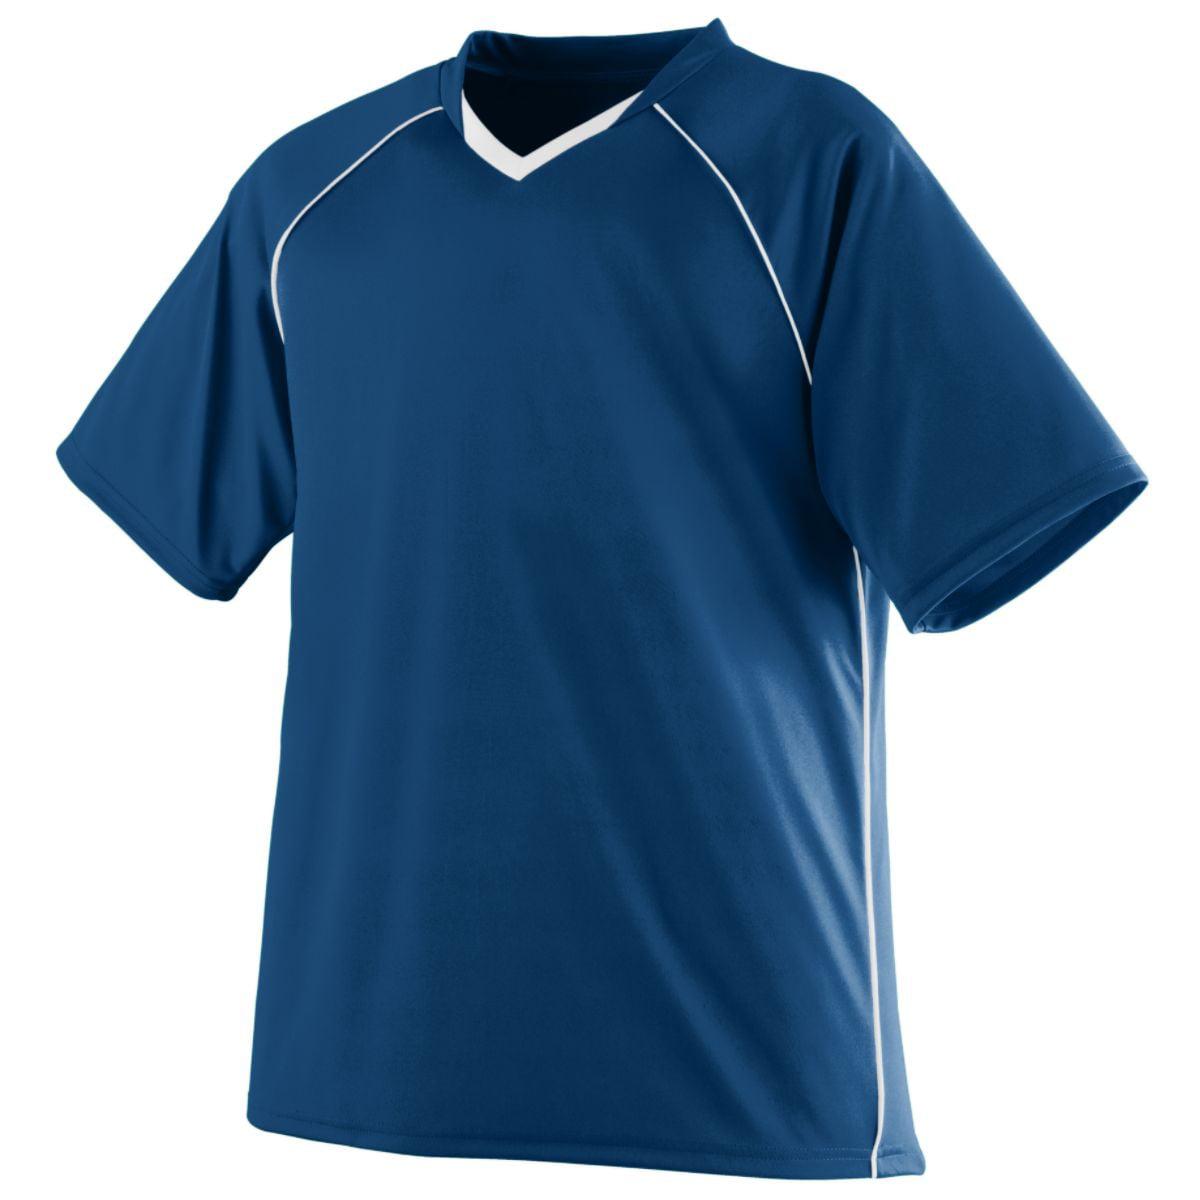 Augusta Striker Jersey Nav/Whi Xl - image 1 of 1